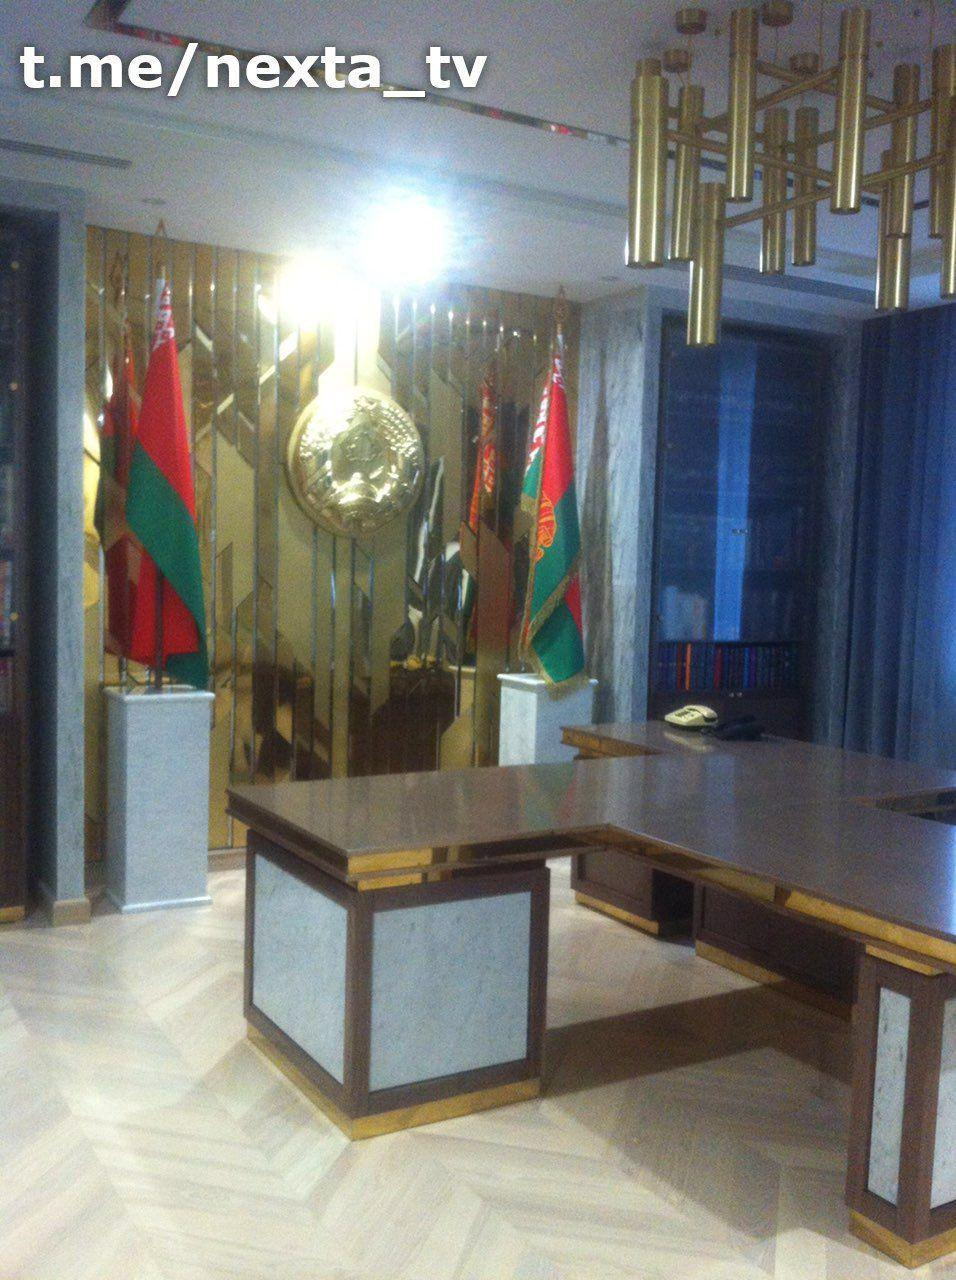 Персональная больничная палата Александра Лукашенко